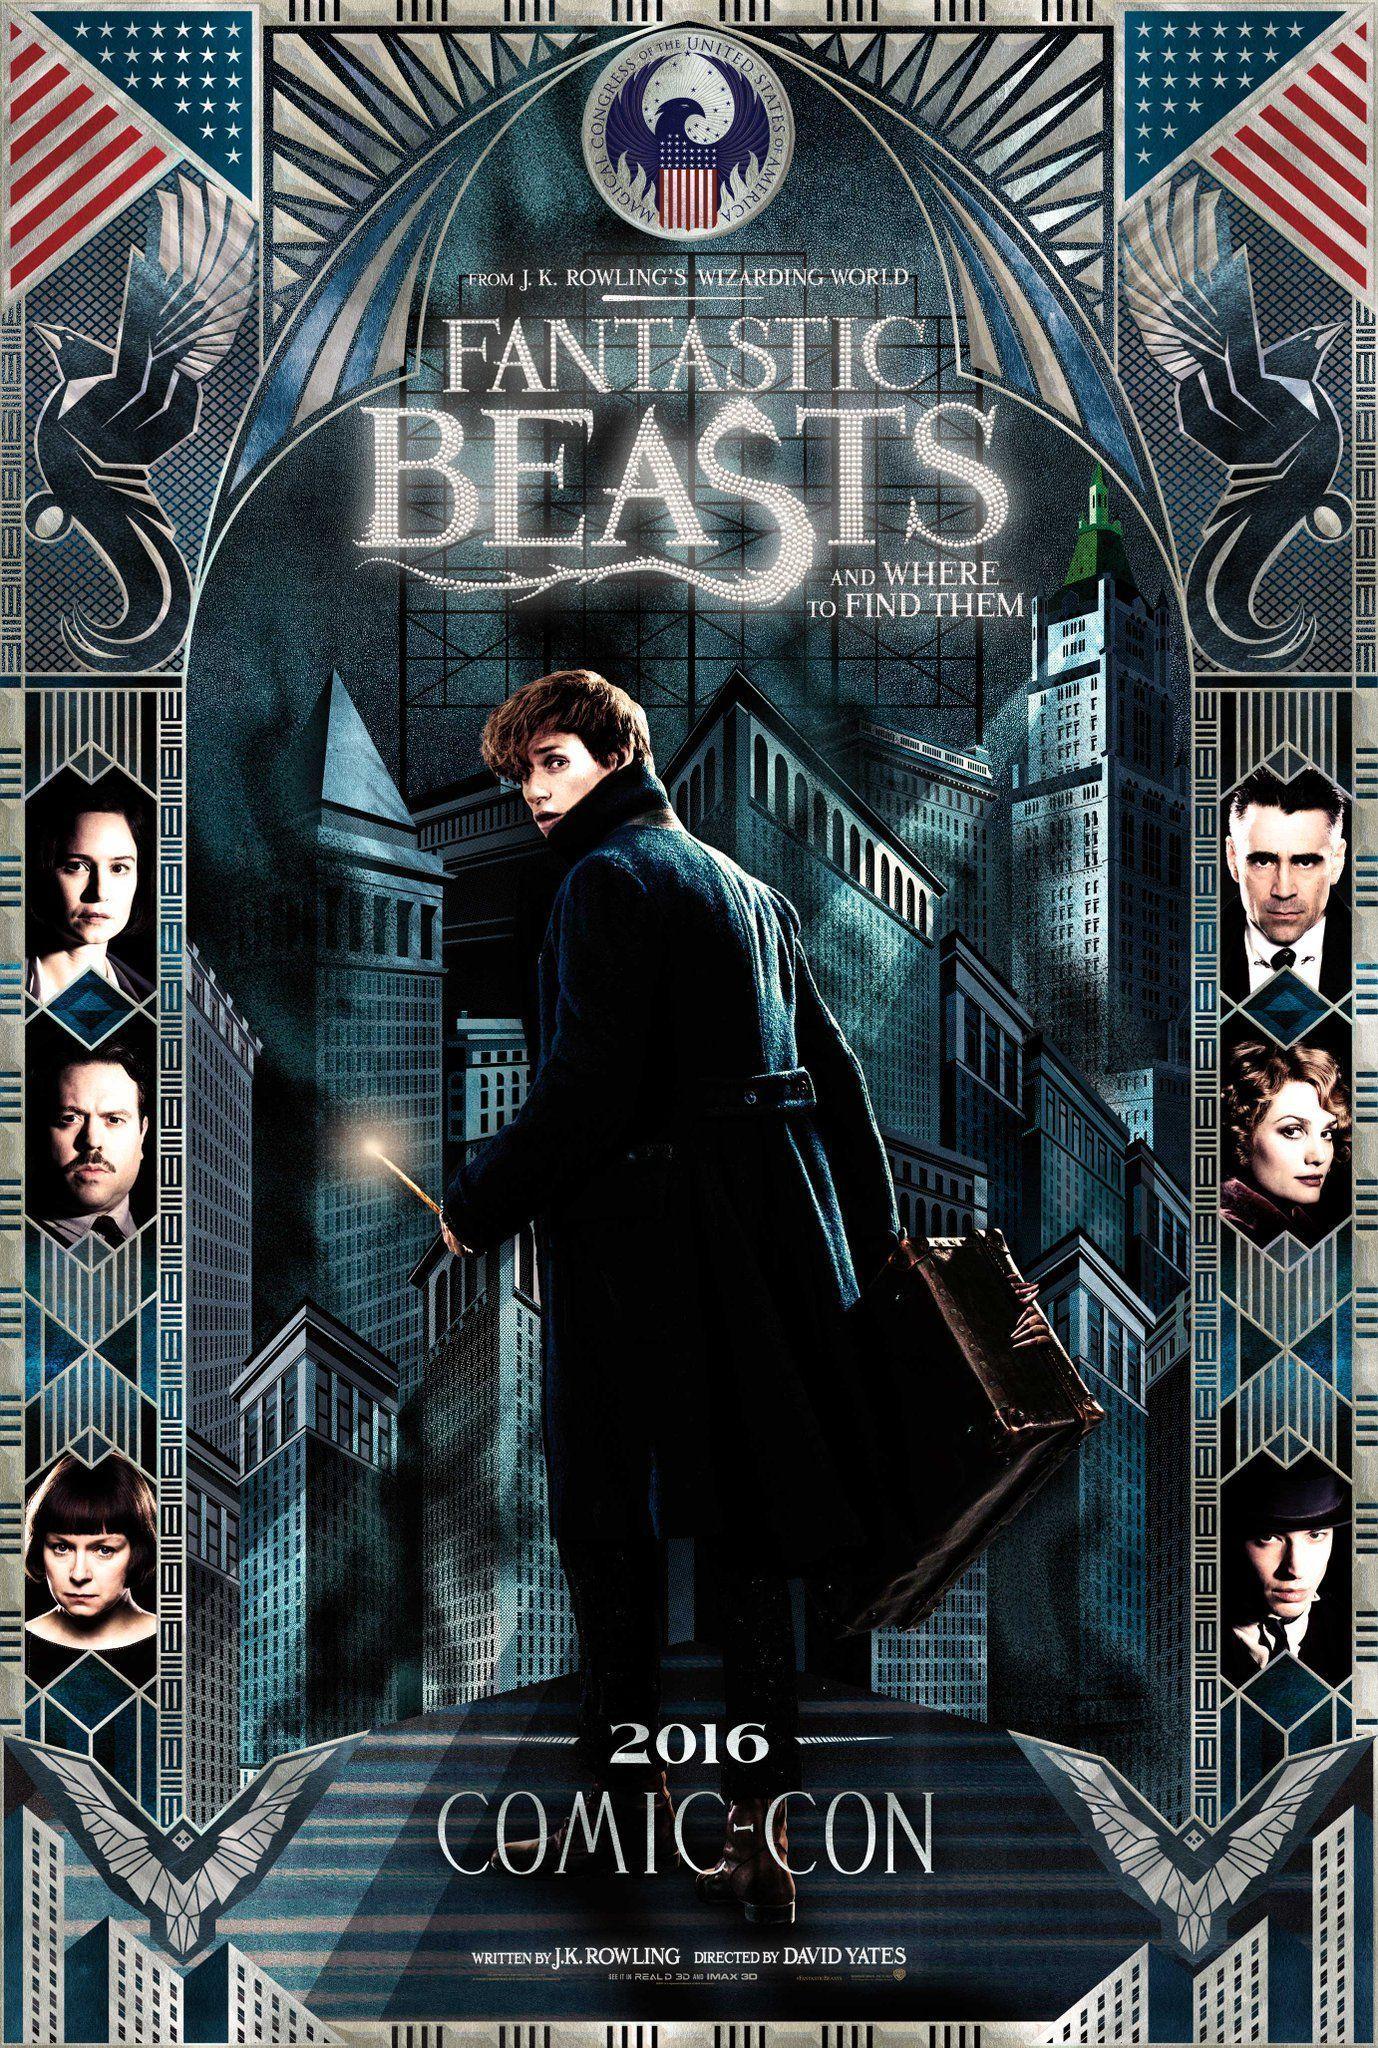 fantastic beast poster - MagaZinema